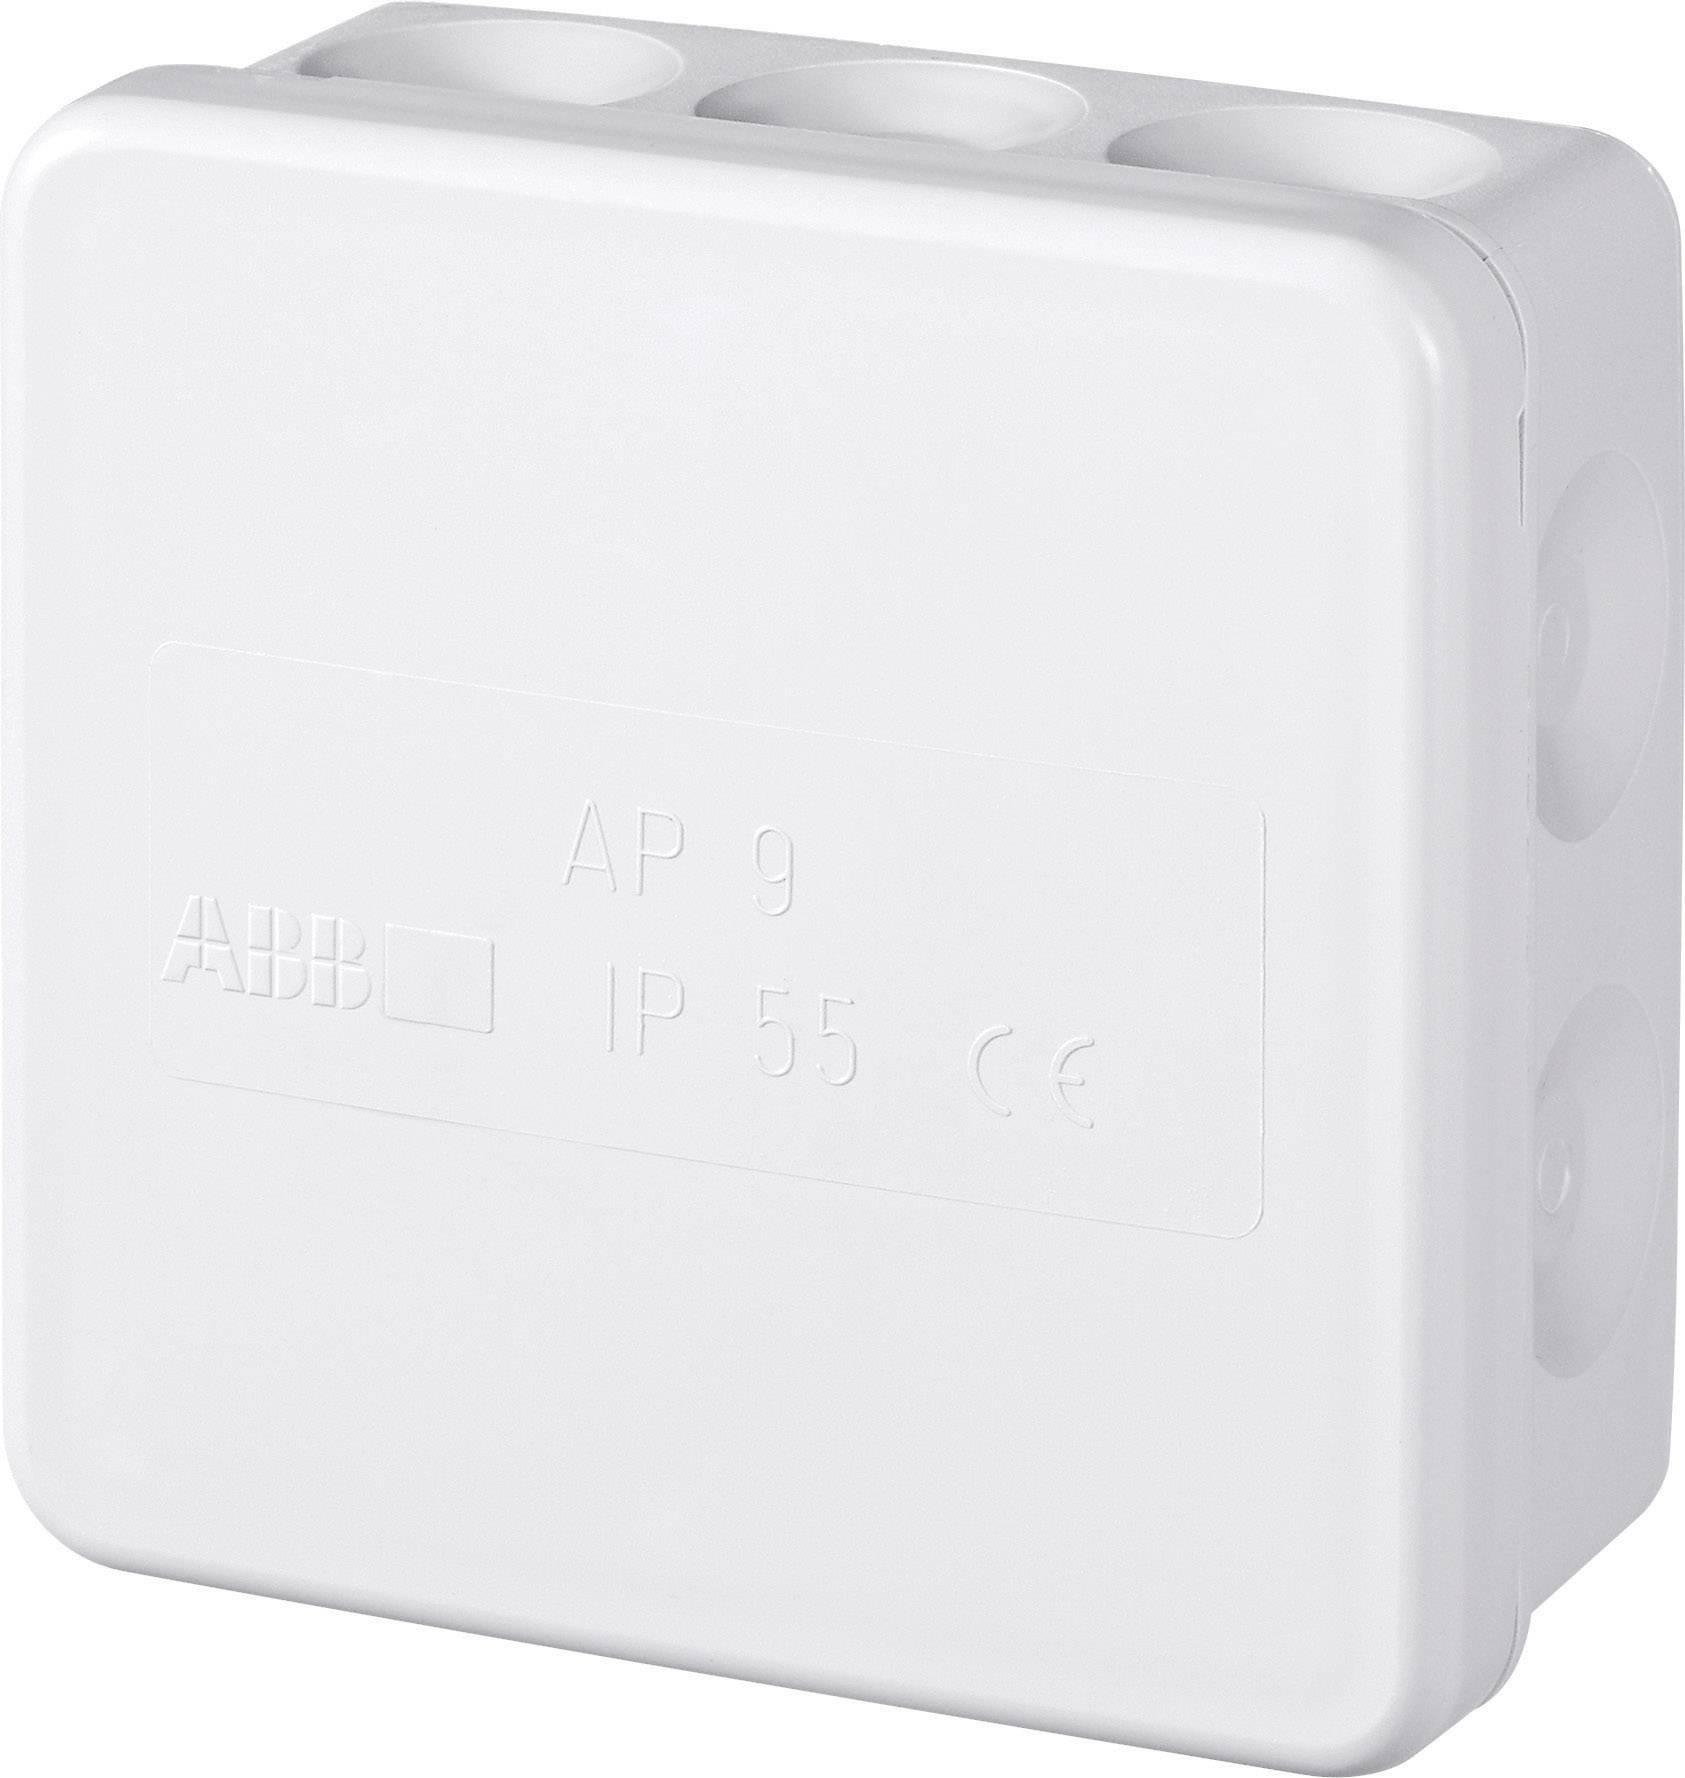 Rozbočovacia krabica IP55 ABB, 104 x 104 mm, sivá, 2TKA140003G1